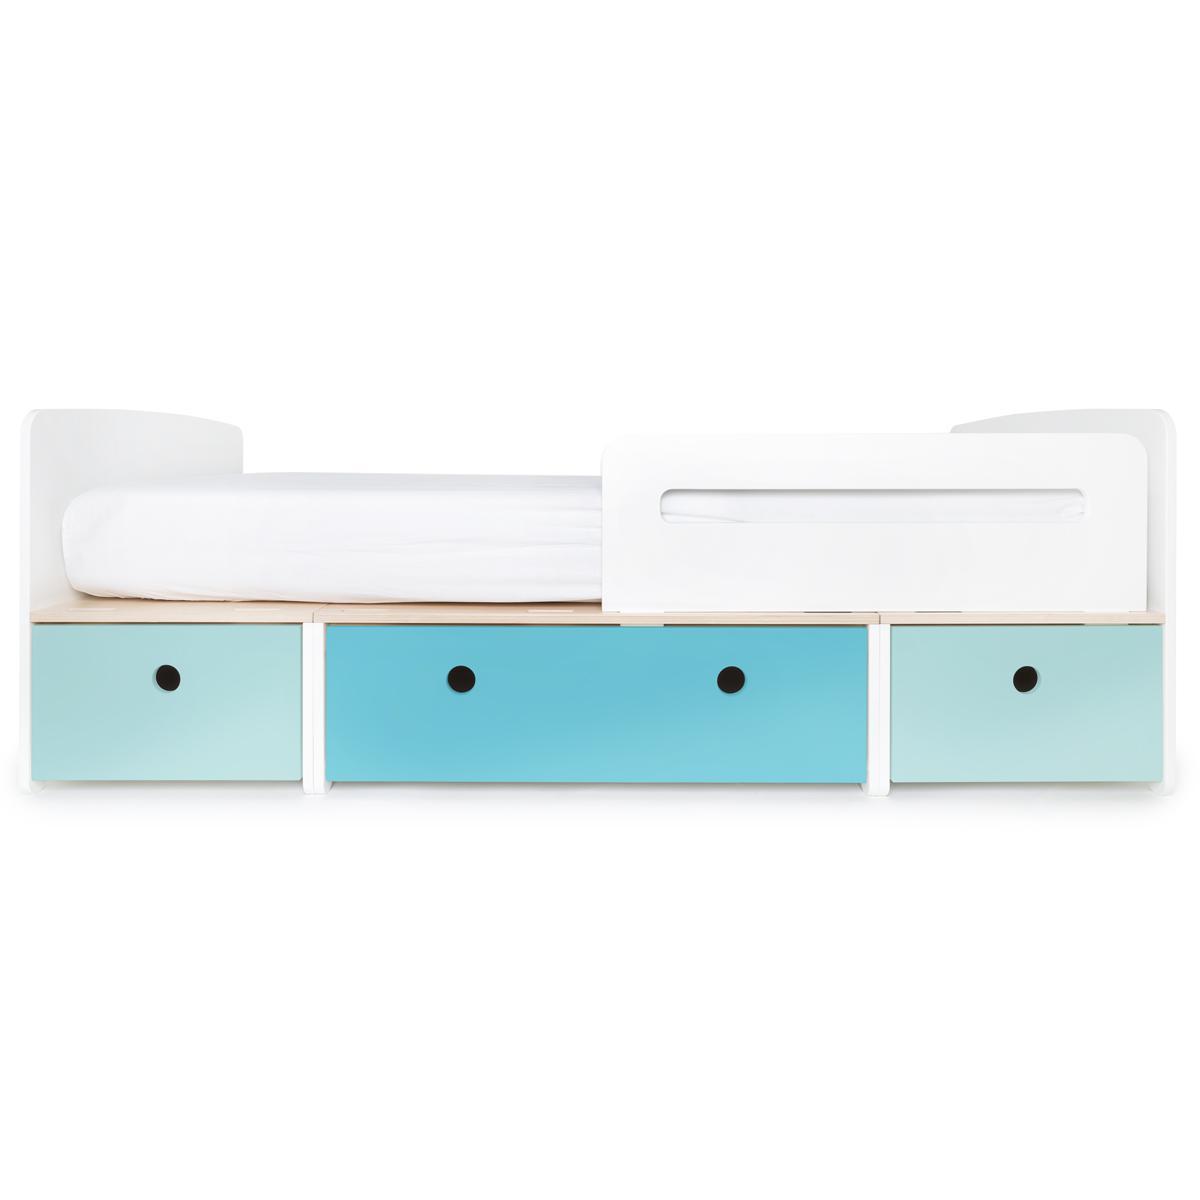 Kinderbett 90x200cm COLORFLEX sky blue-paradise blue-sky blue